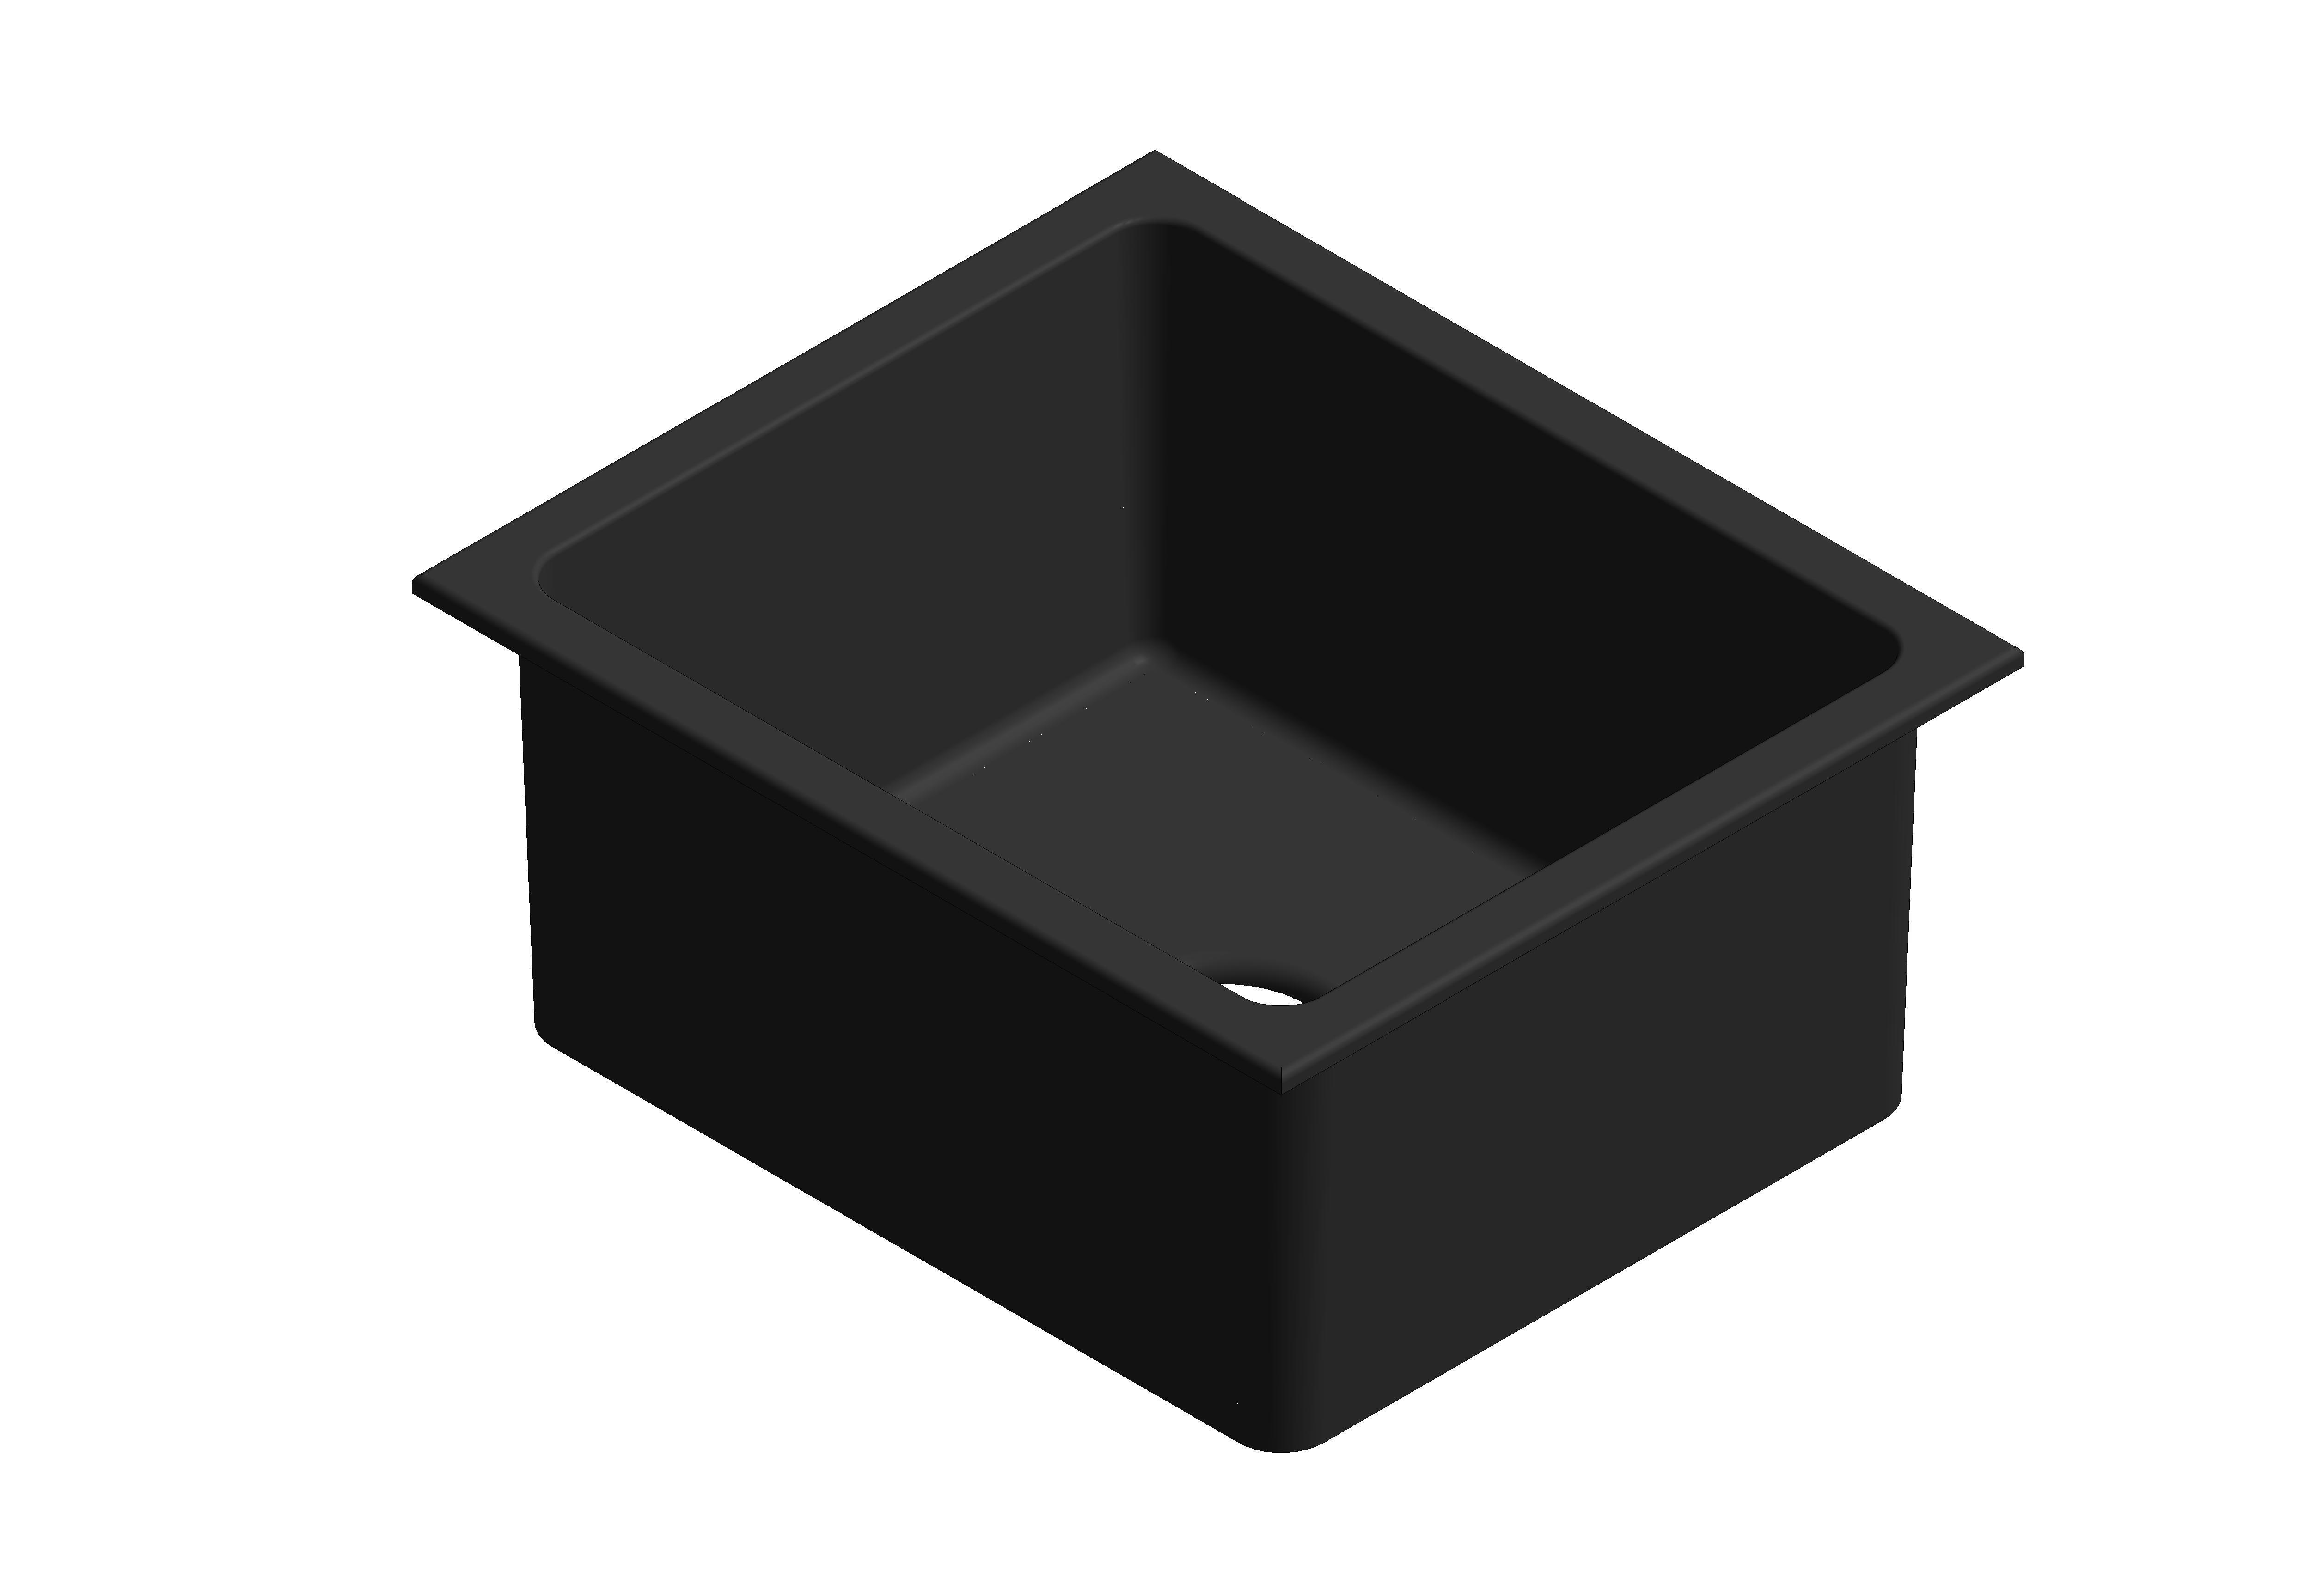 Image of Grohe K700U Sink 31653